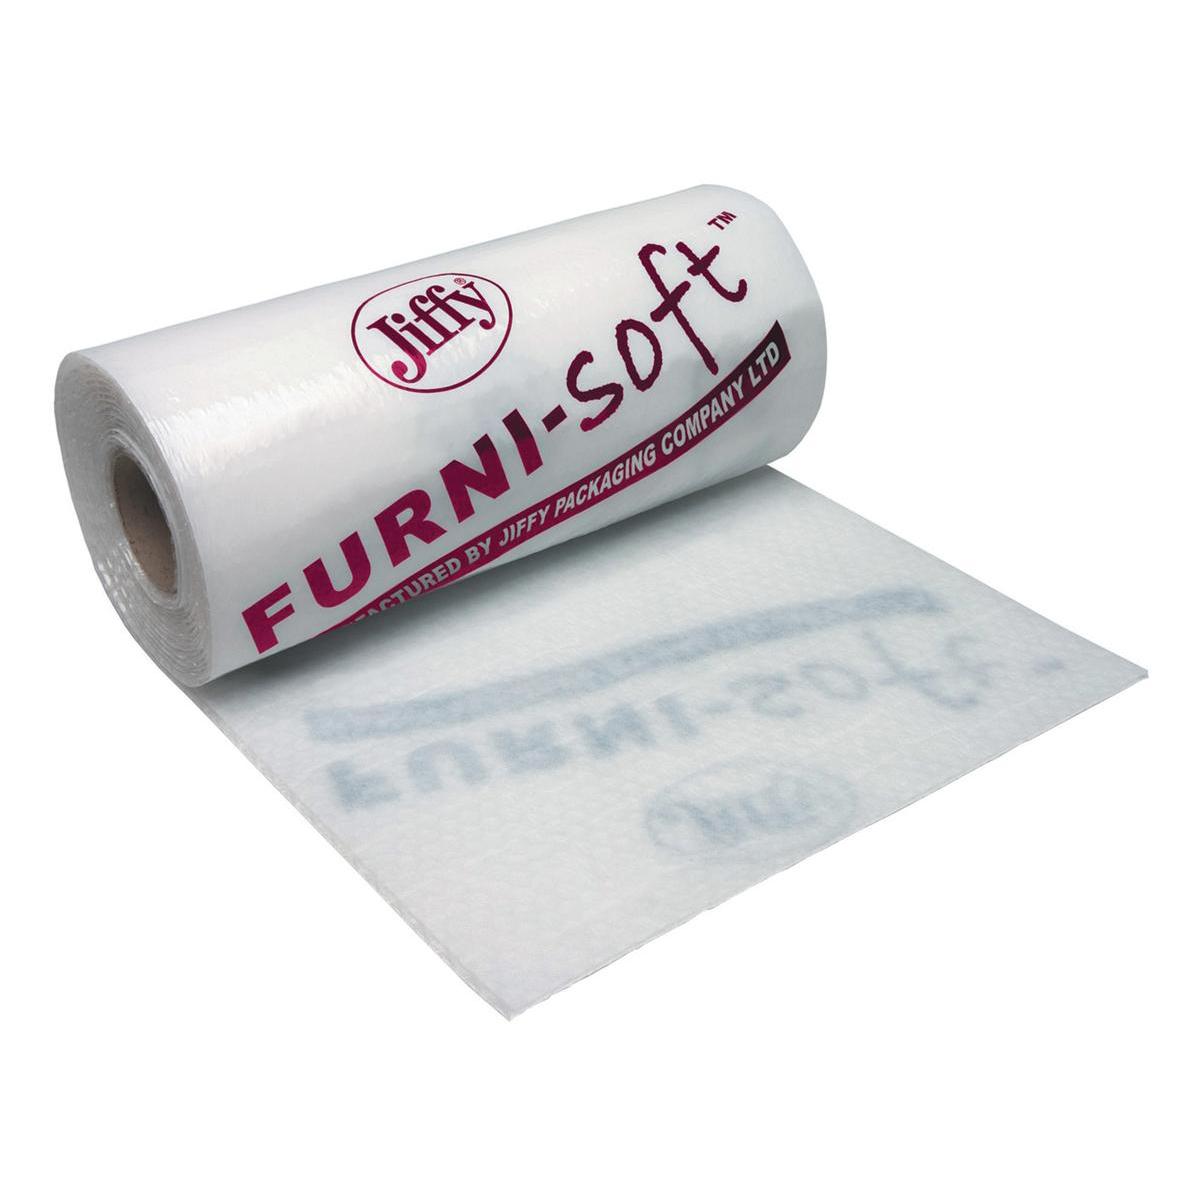 Jiffy Furni-soft Roll Soft Low Density Polyethylene Furniture Protection 1200mmx50m Clear Ref BLAM39561